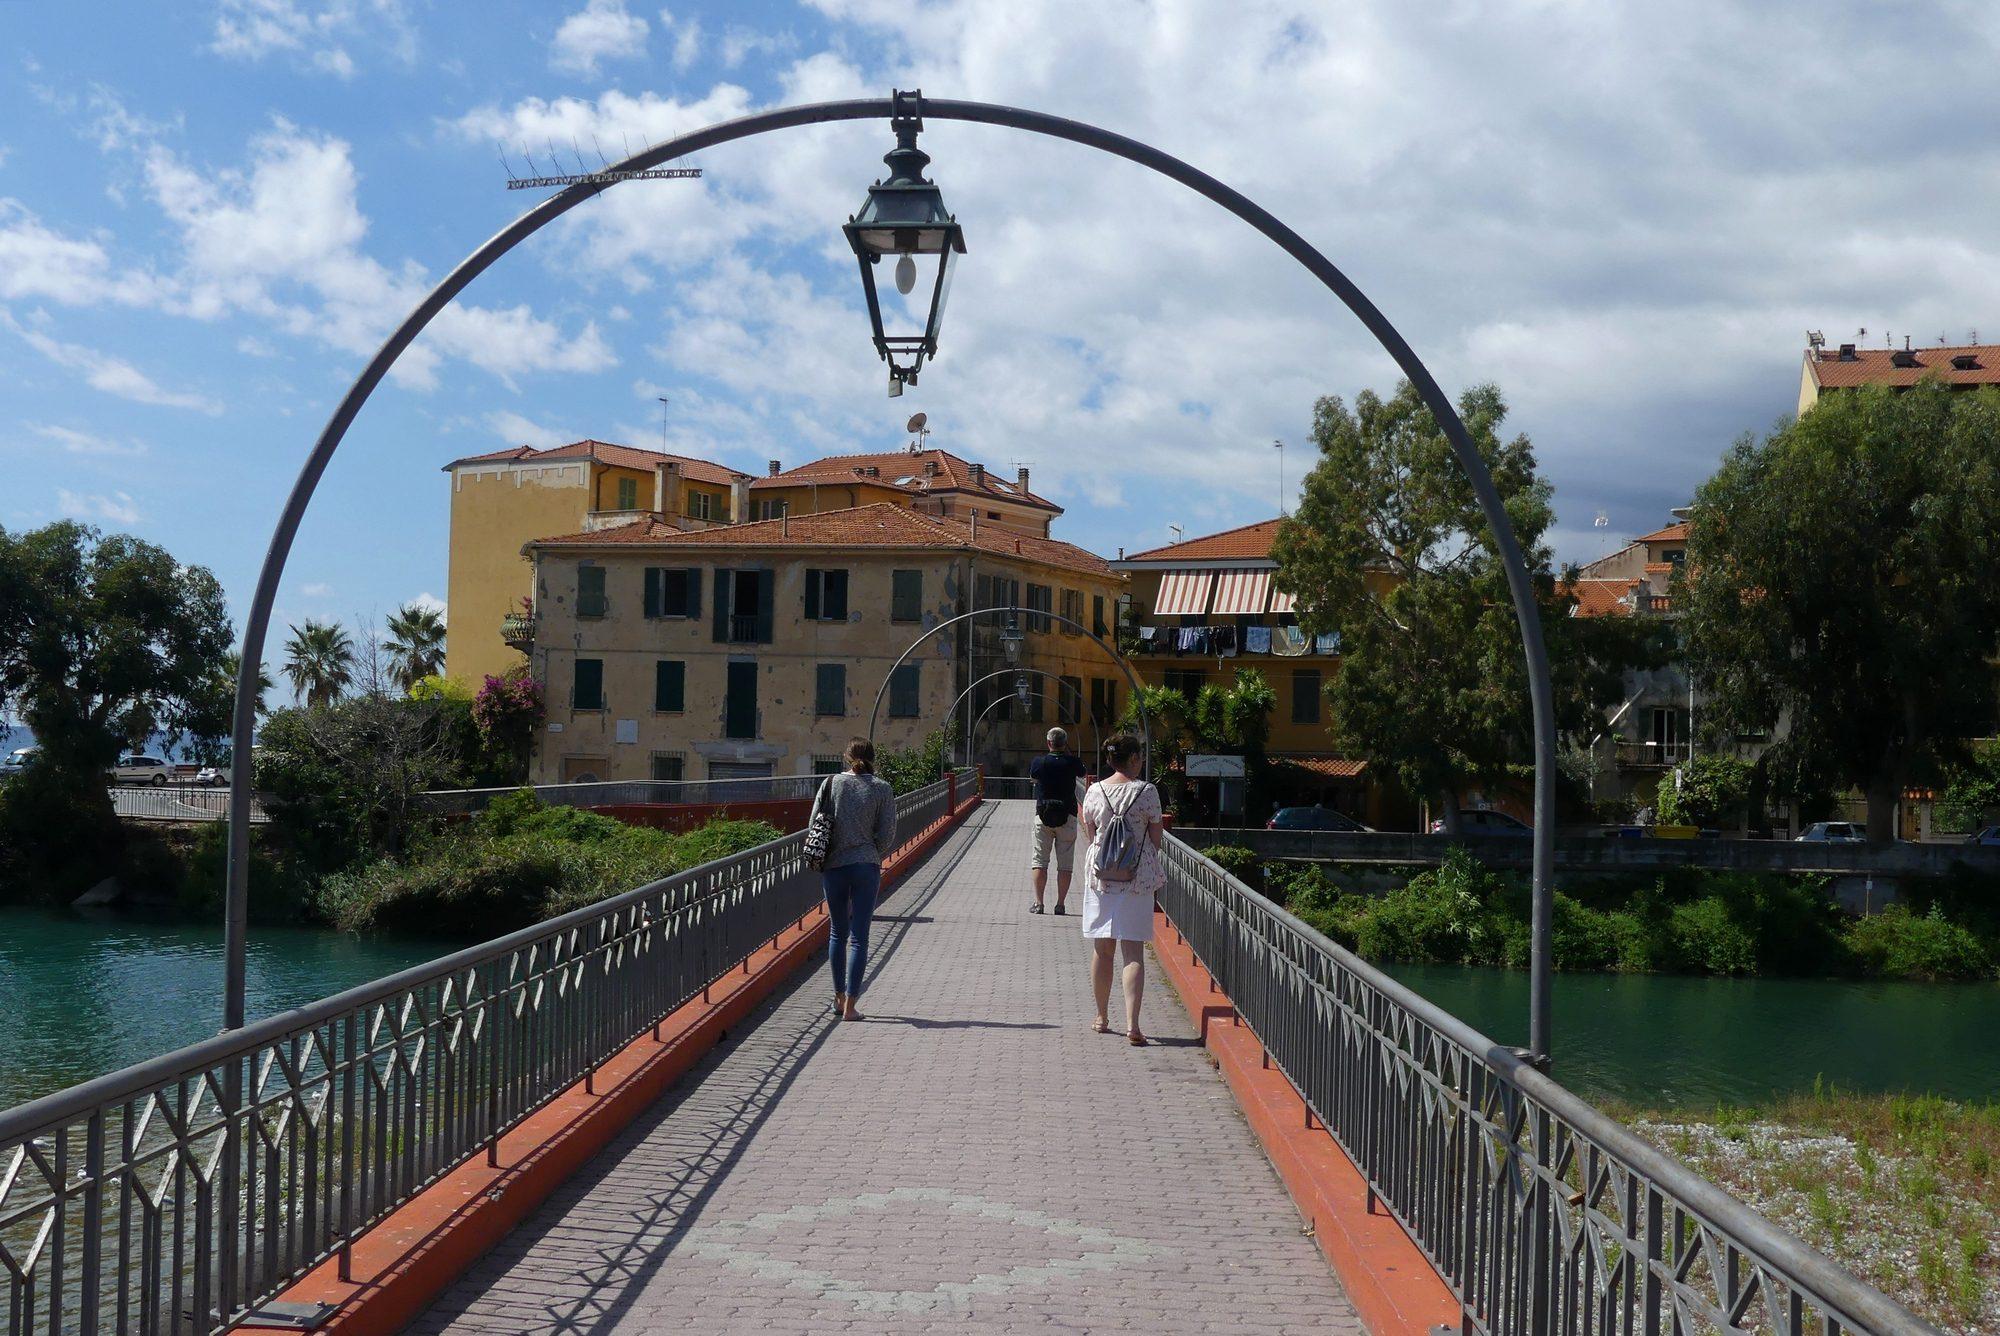 Brücke über den Fluss Roia in Ventimiglia